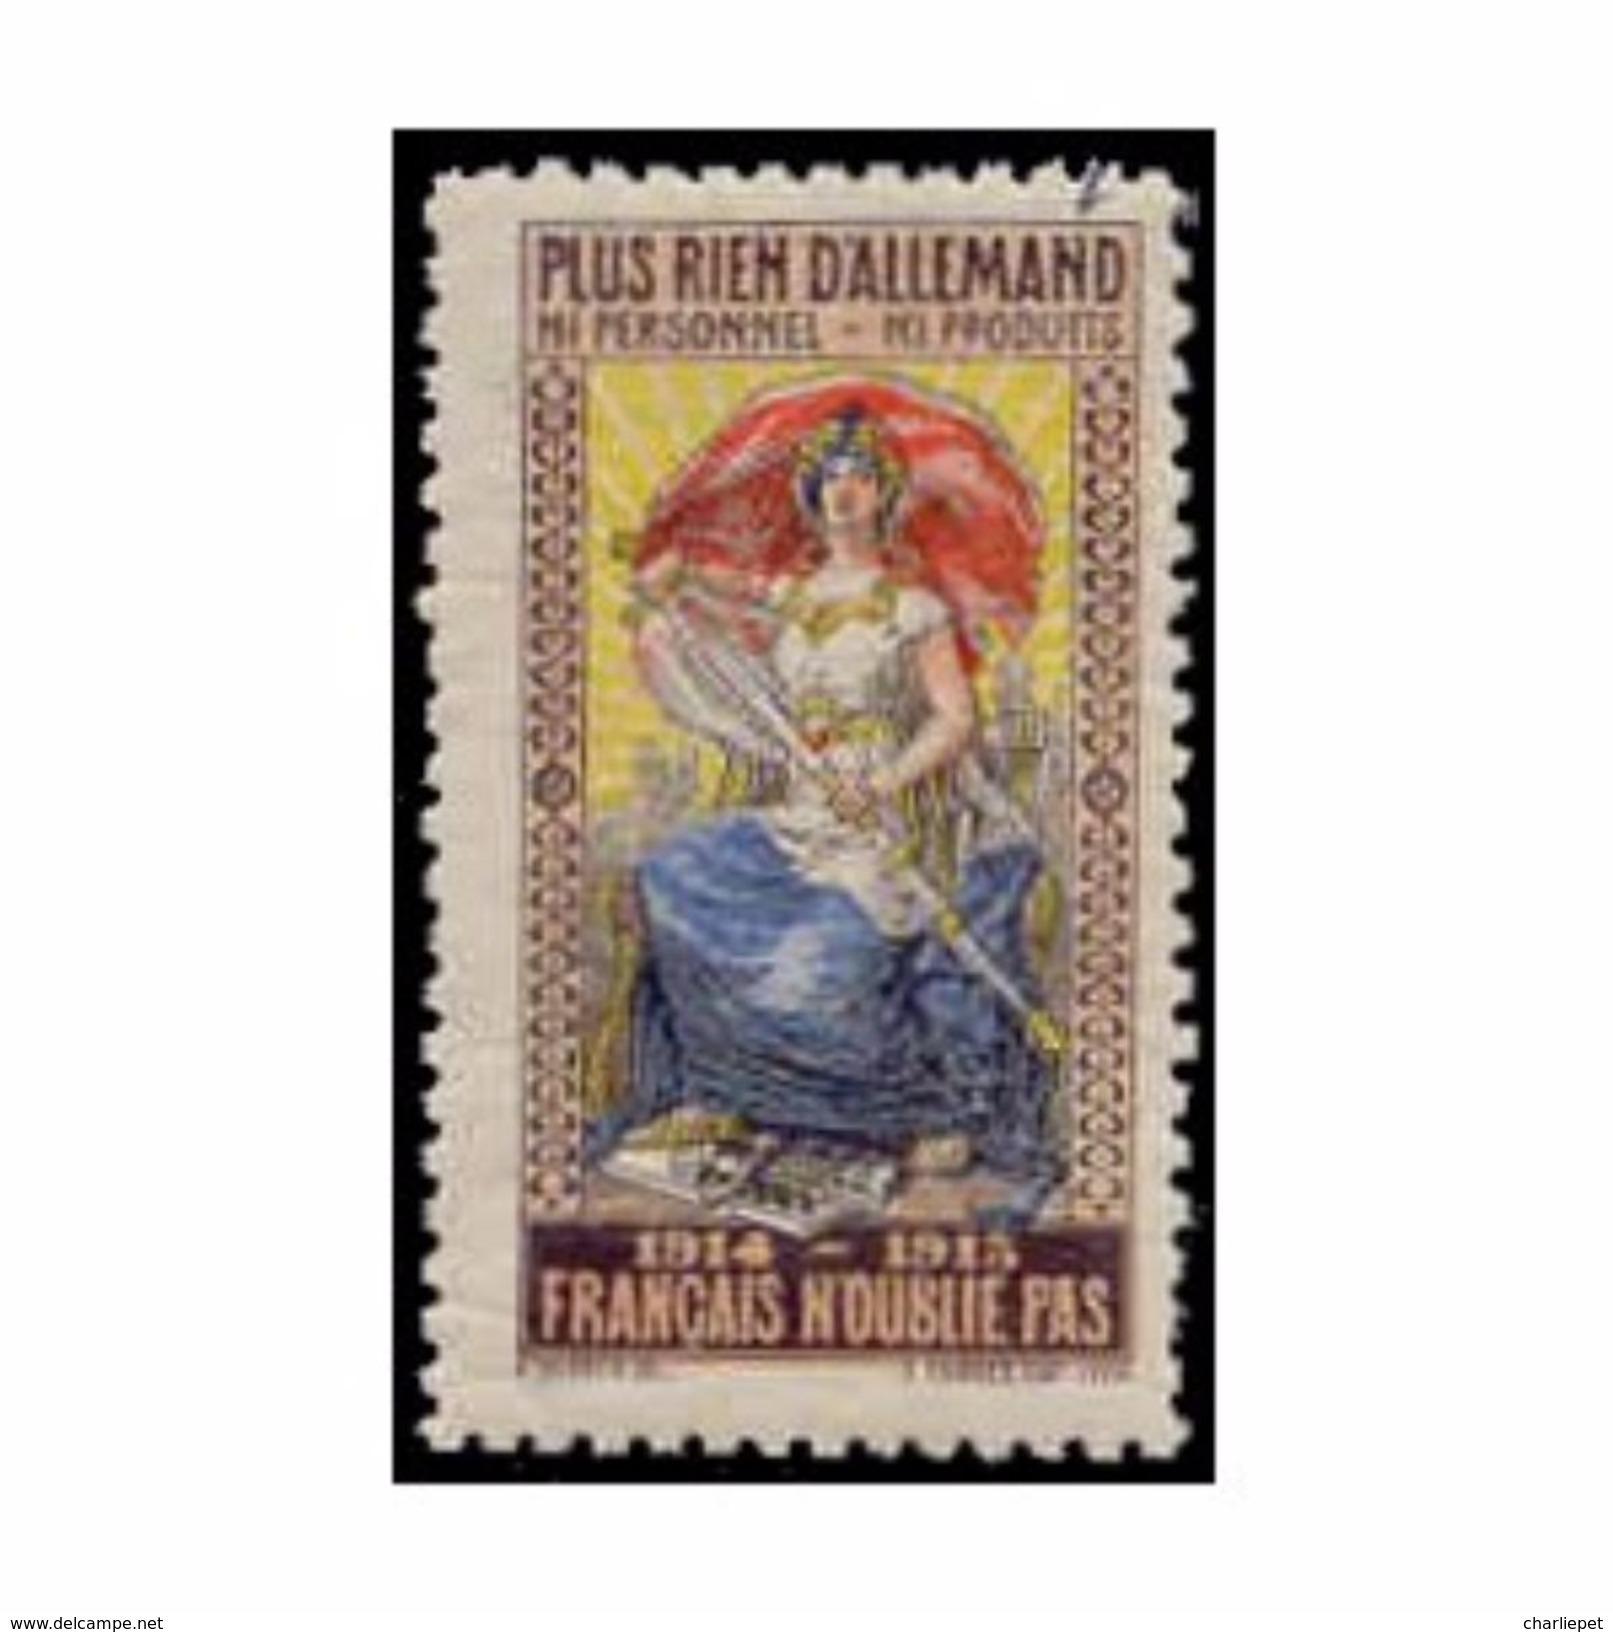 France WWI Plus Rien D'allemand  Stamps Vignette Poster Stamp - Erinnofilia